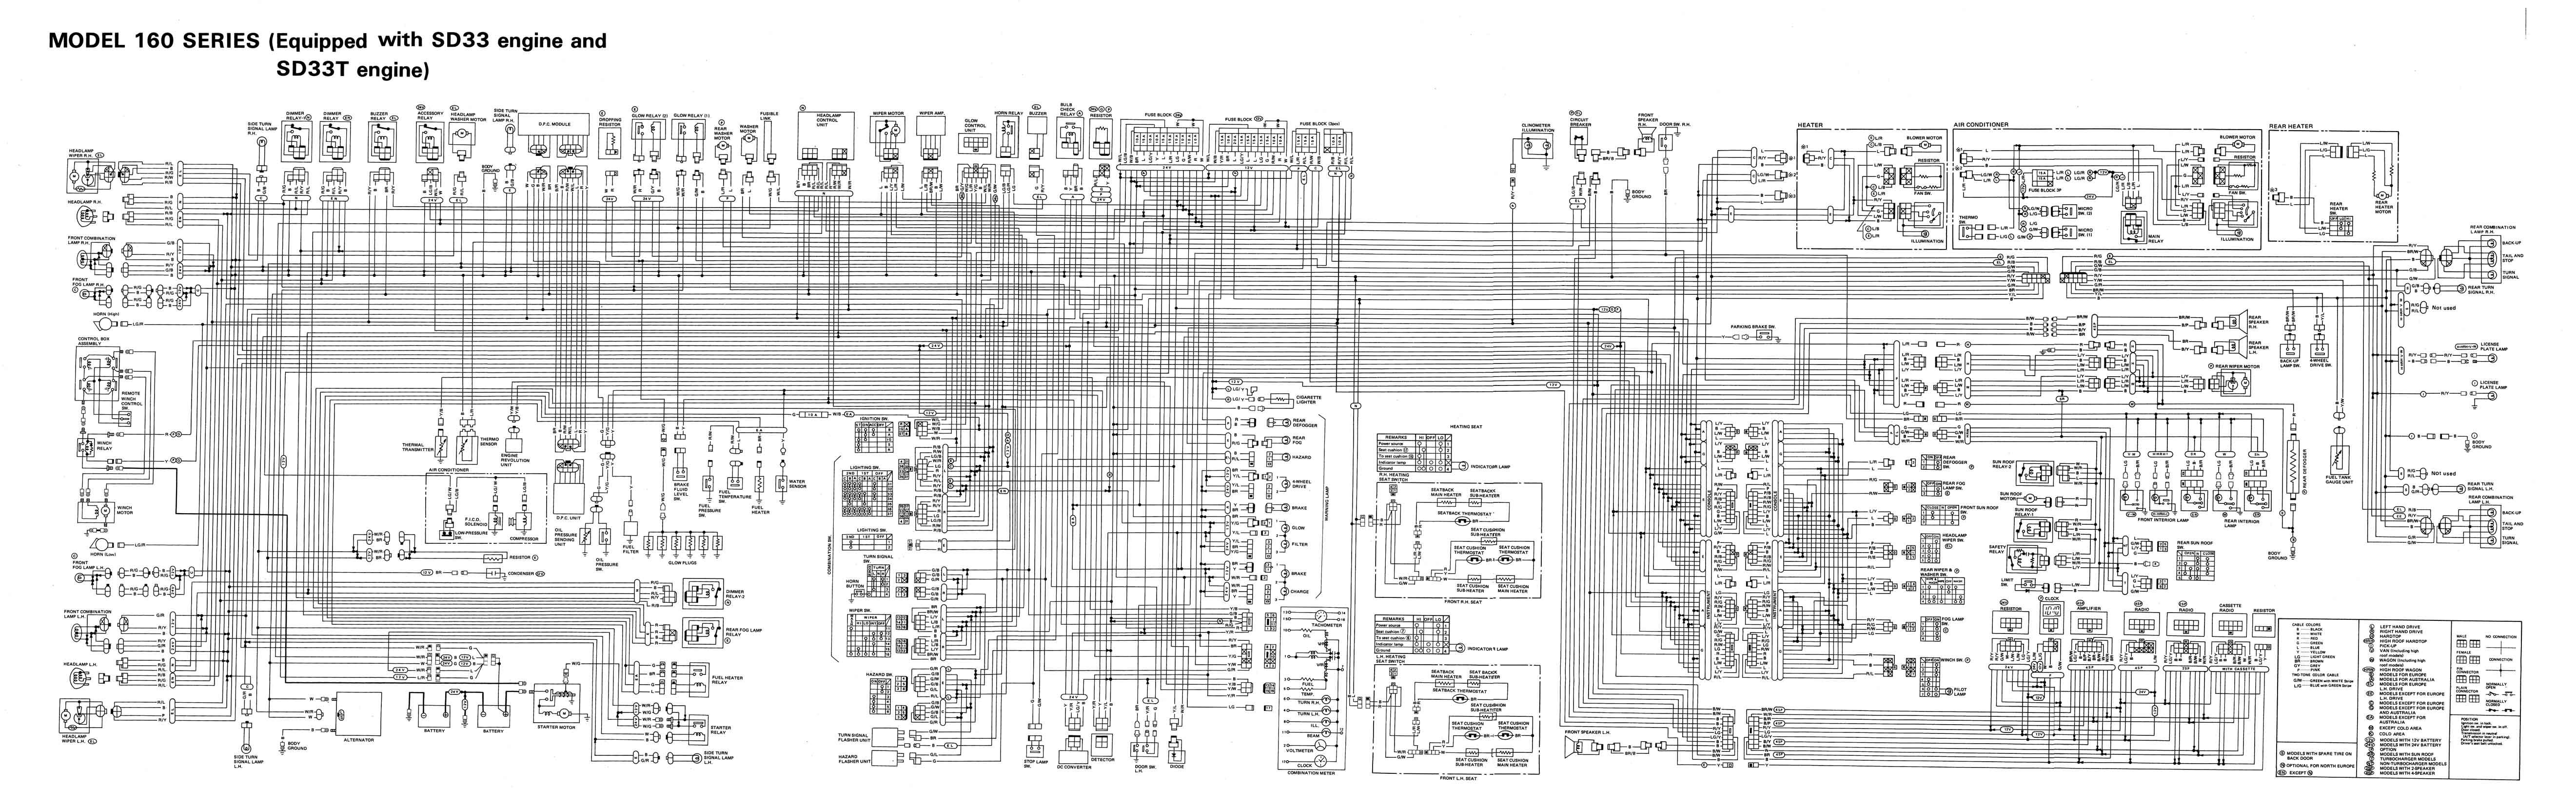 Miraculous Wiring Diagram Nissan Ga15 Engine Wiring Library Wiring Database Ittabxeroyuccorg